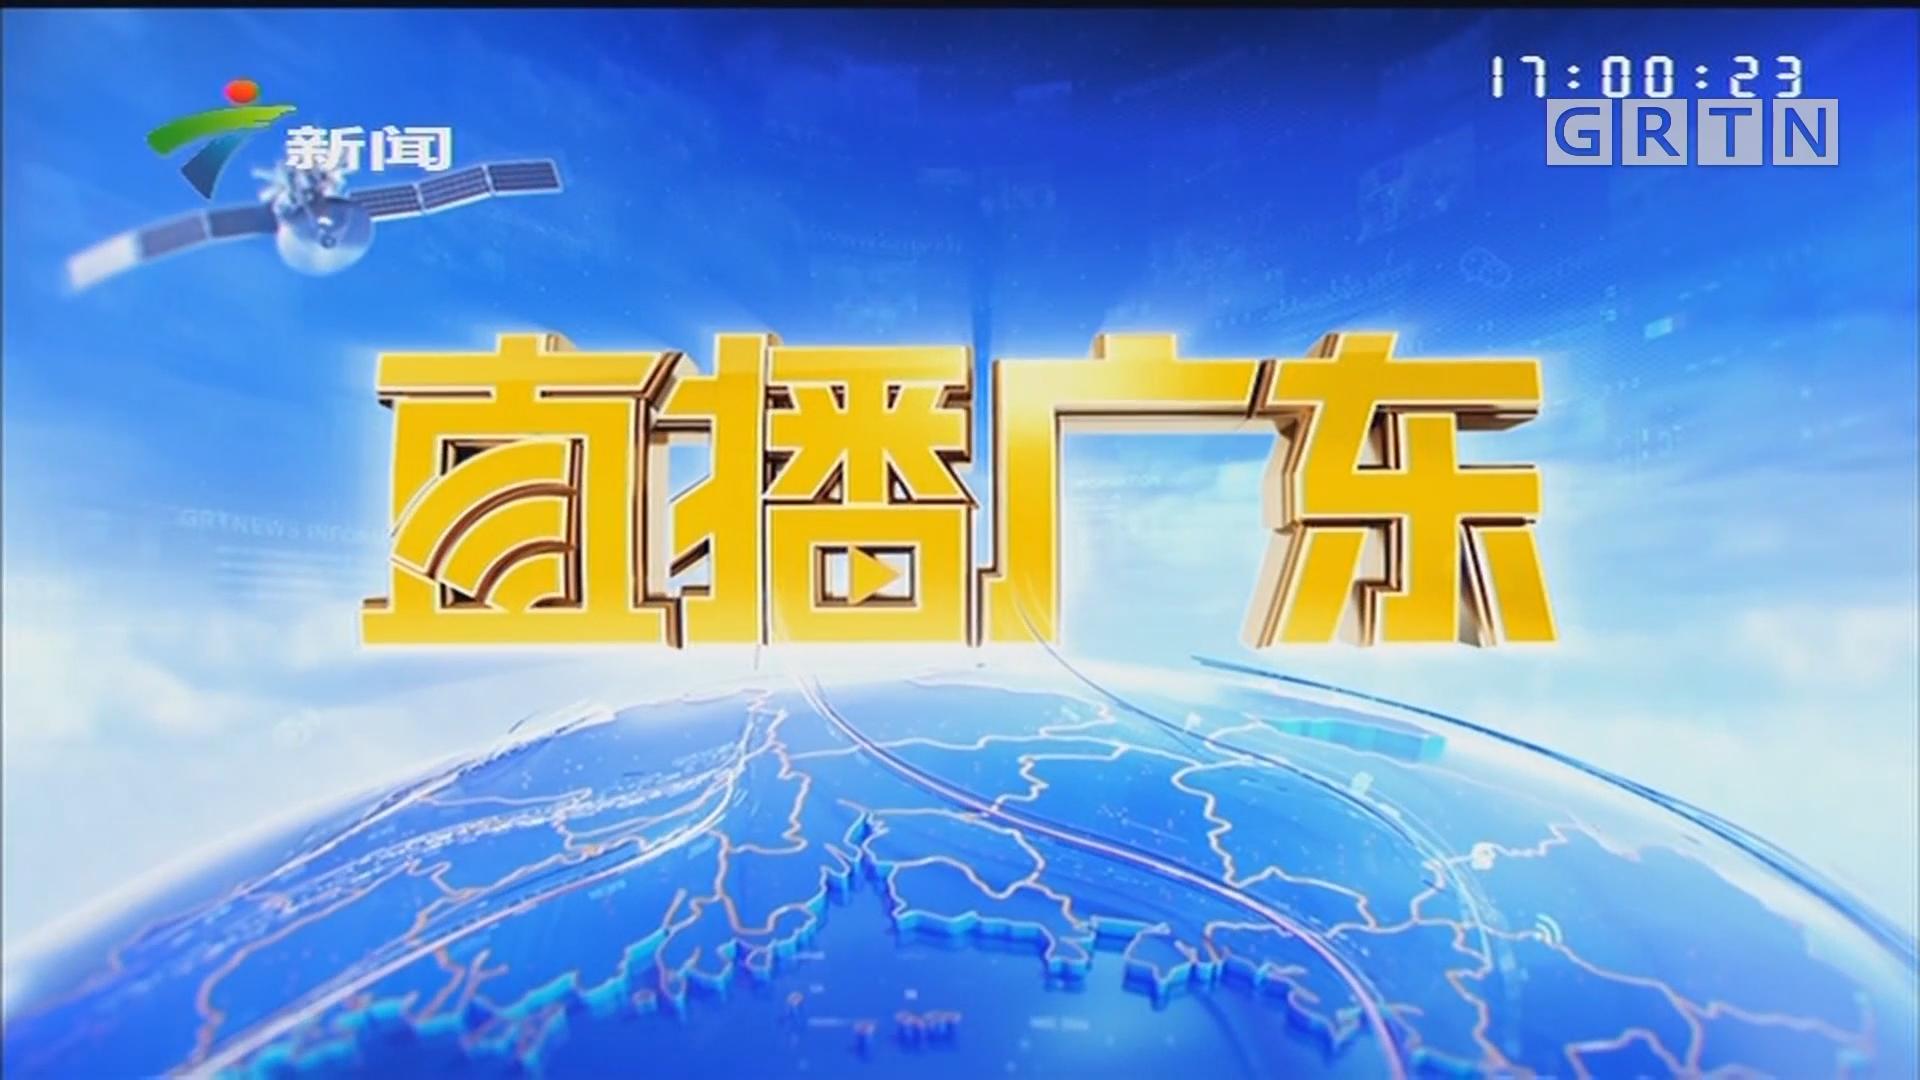 [HD][2019-06-15]直播广东:关注河源紫金东江大桥坍塌事故:6名潜水员下水 出动声纳进行多轮搜救